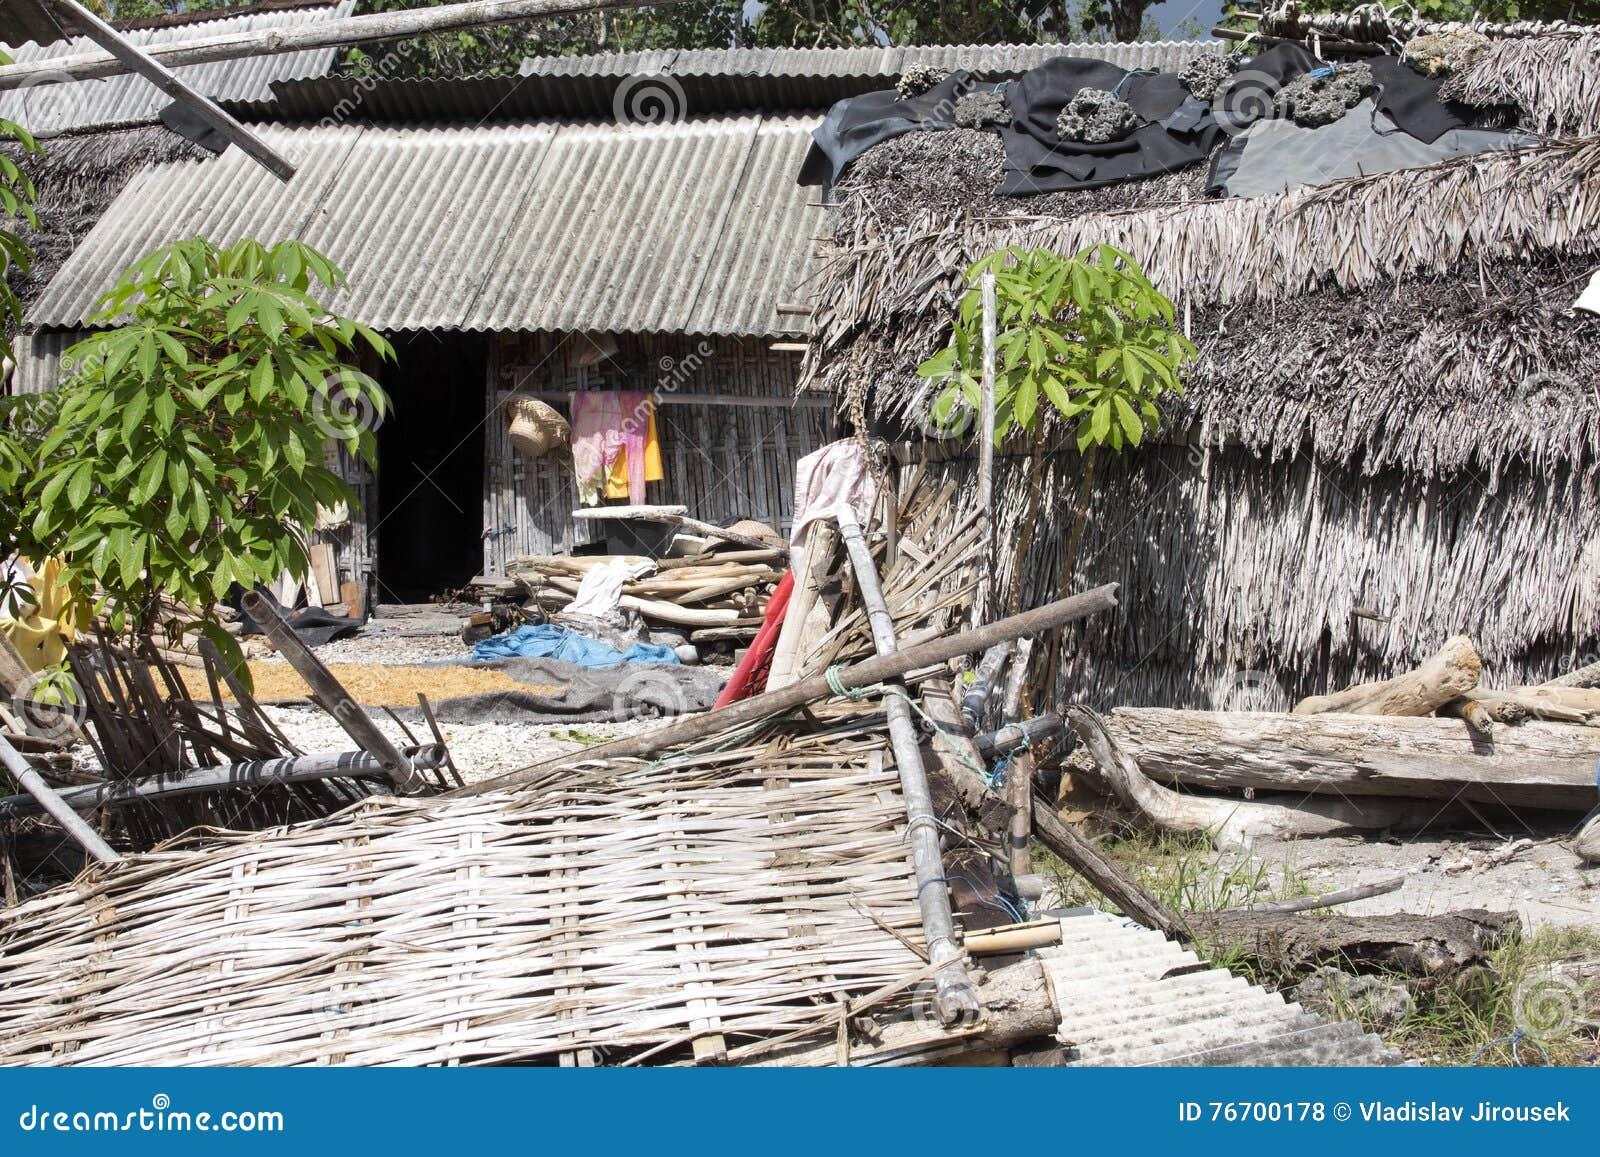 Recolectores pobres da alga da cabana, Nusa Penida, Indonésia